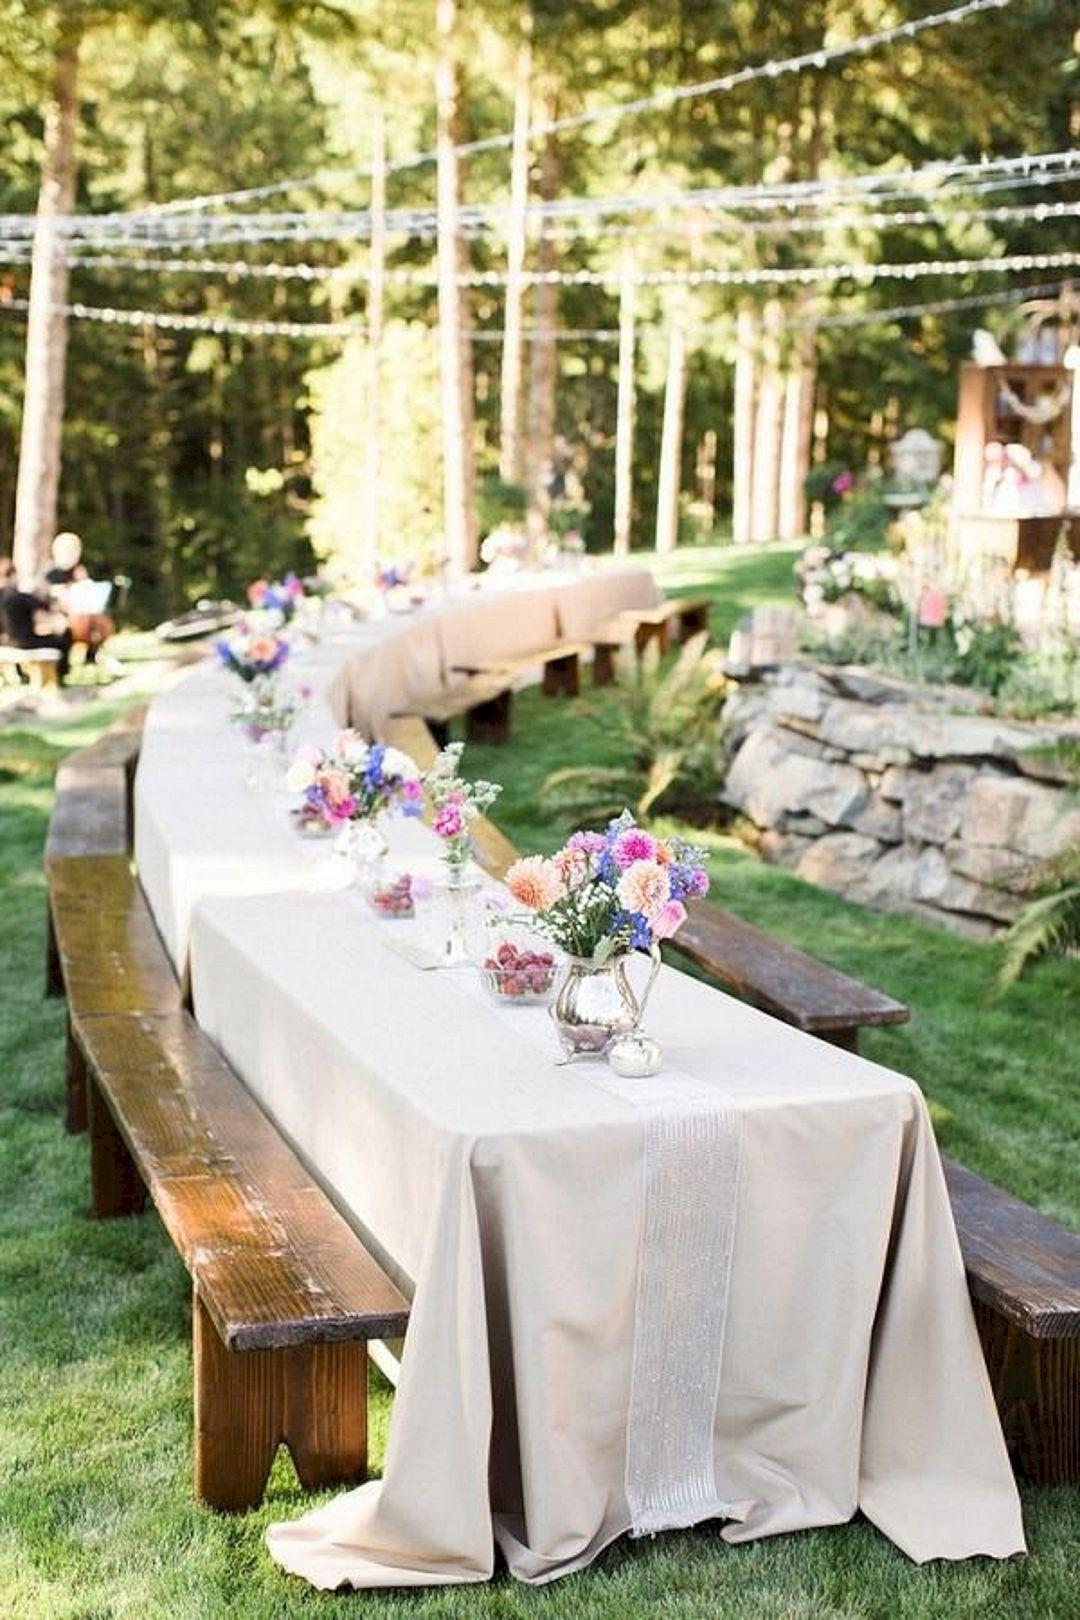 Top 5 Rustic Backyard Wedding Party Decor Ideas Your Pinterest